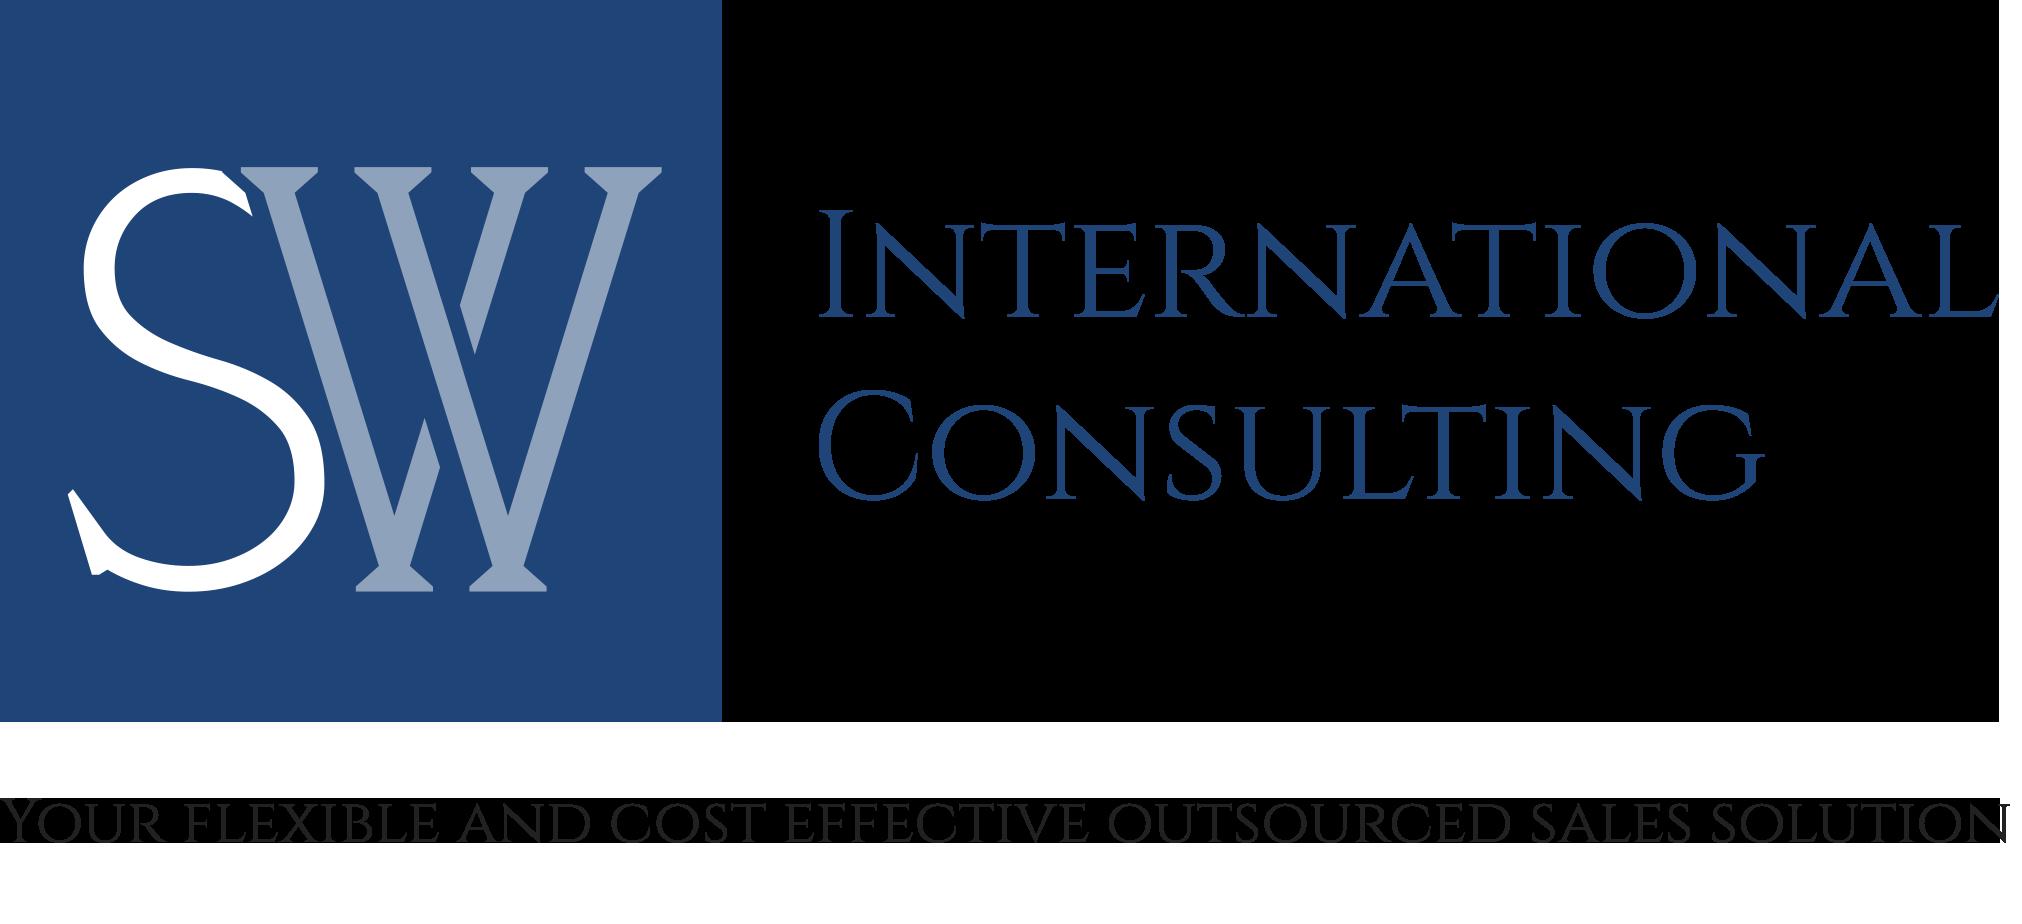 SW international Consulting logo